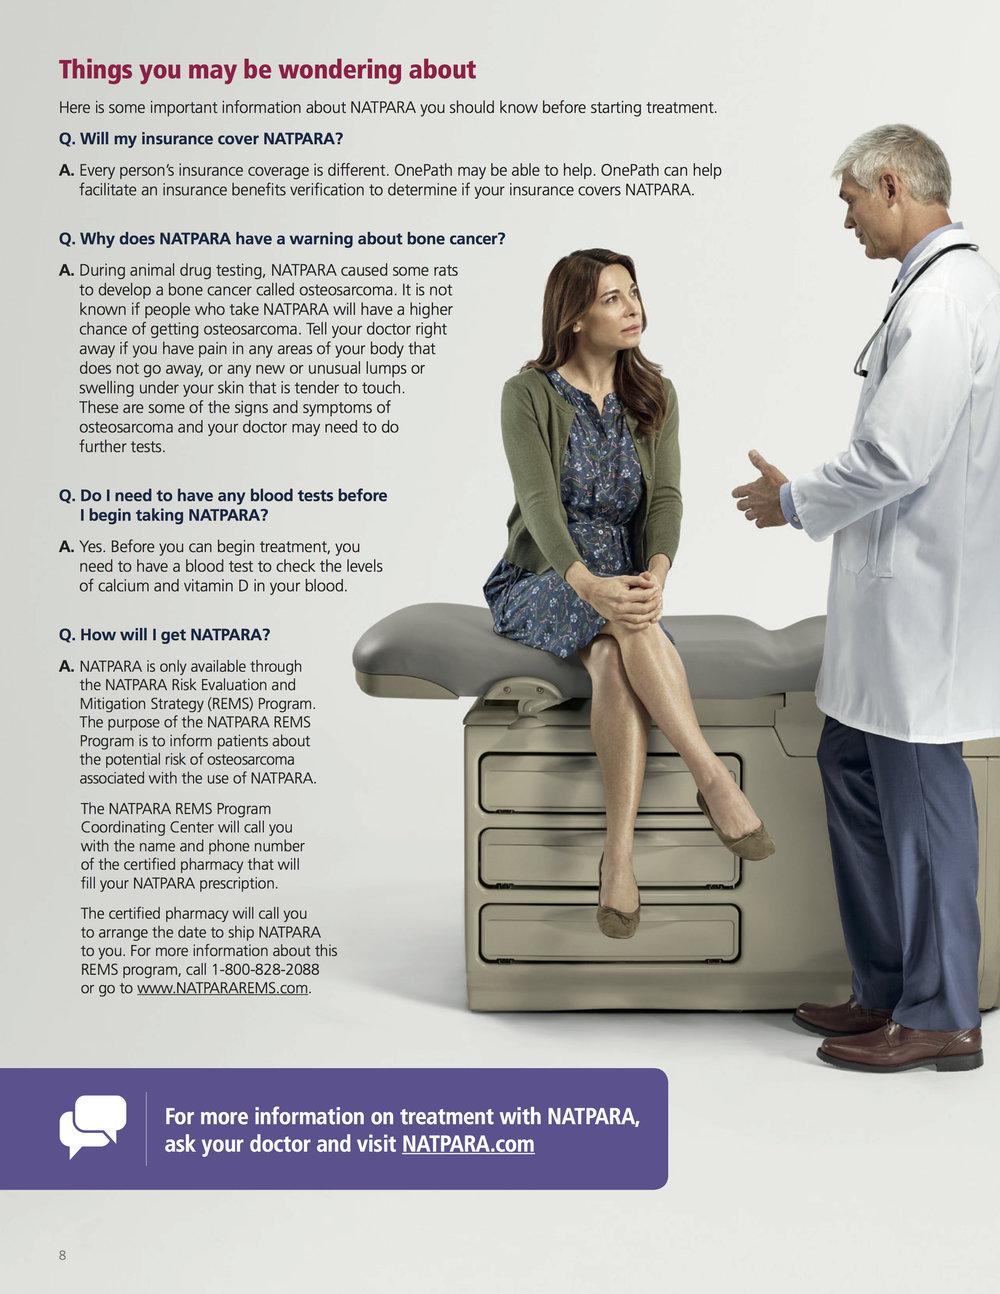 NATP16CDPR4900_Patient_Brochure_DIGITAL_S16292_r7_CF-dragged-1.jpg